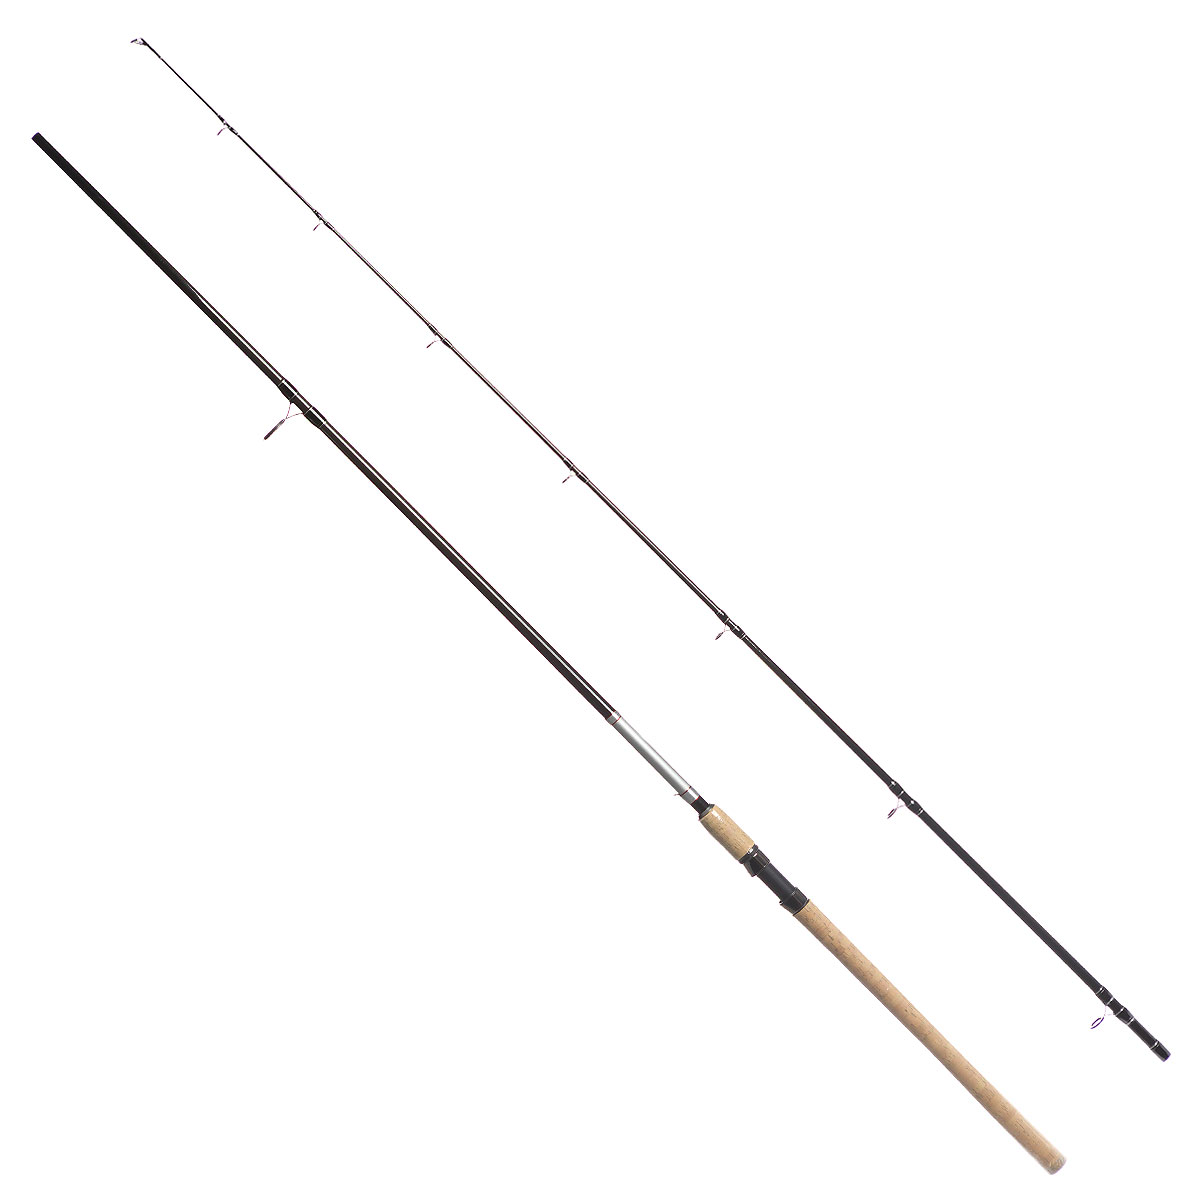 Удилище спиннинговое Daiwa Sweepfire NEW, штекерное, 3 м, 40-100 г